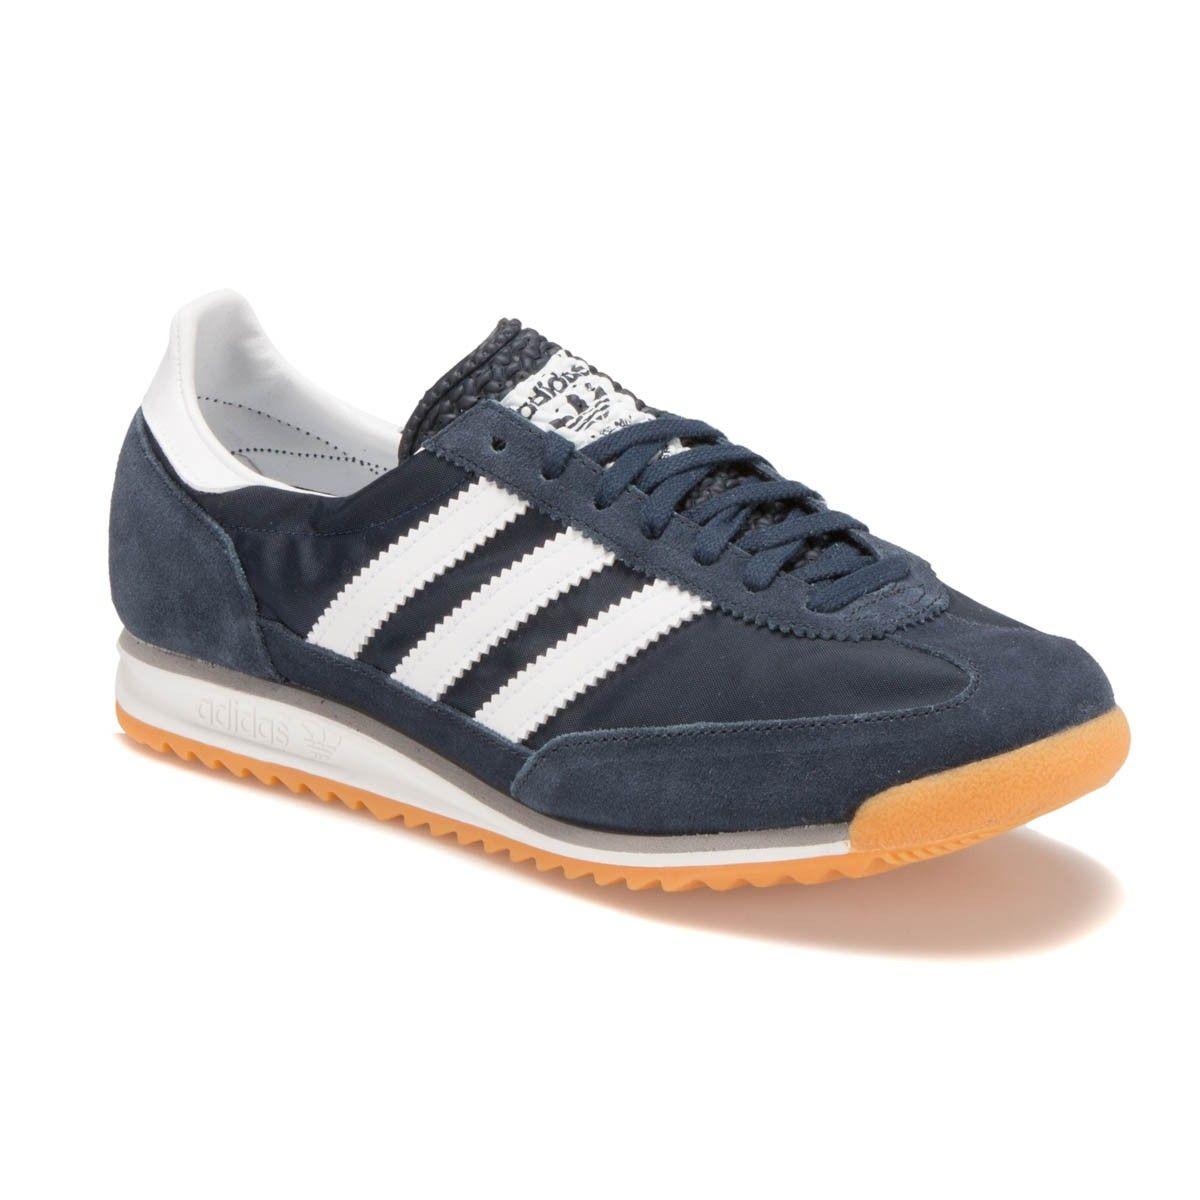 913e82d31 adidas SL 72 Lacivert Erkek Sneaker - Sneaker - Spor Ayakkabı - Erkek